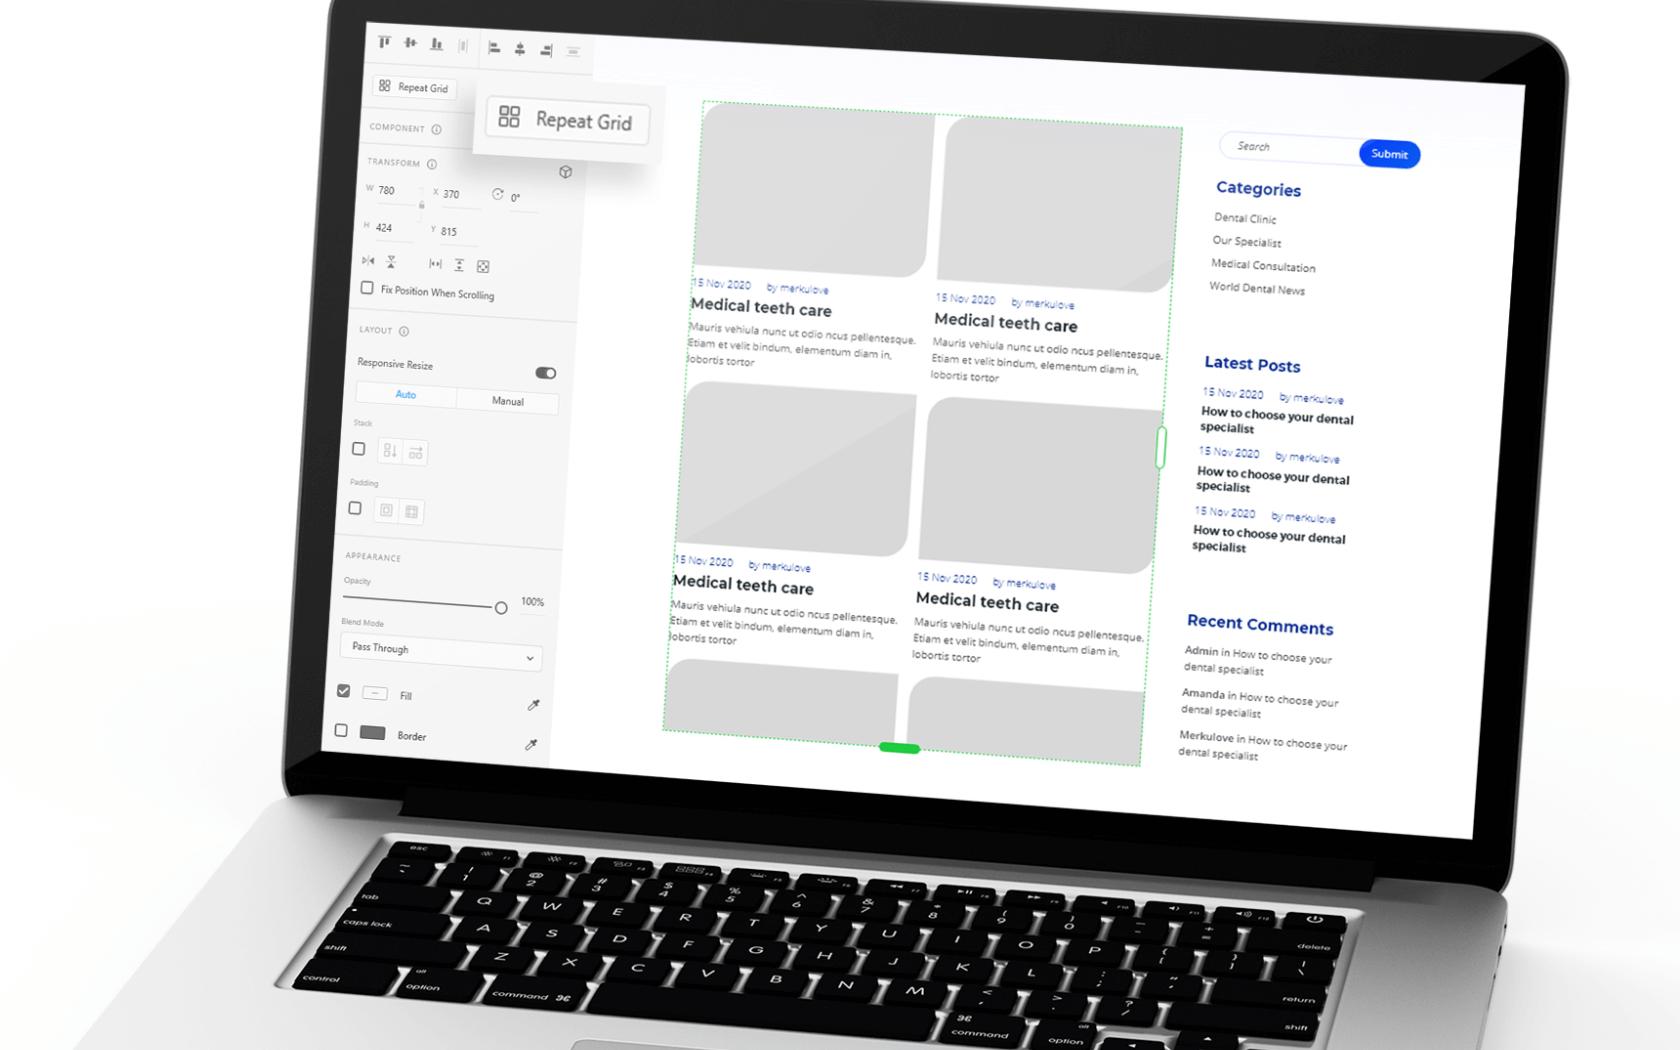 Adobe XD Repeat Grid Feature on Macbook Screen